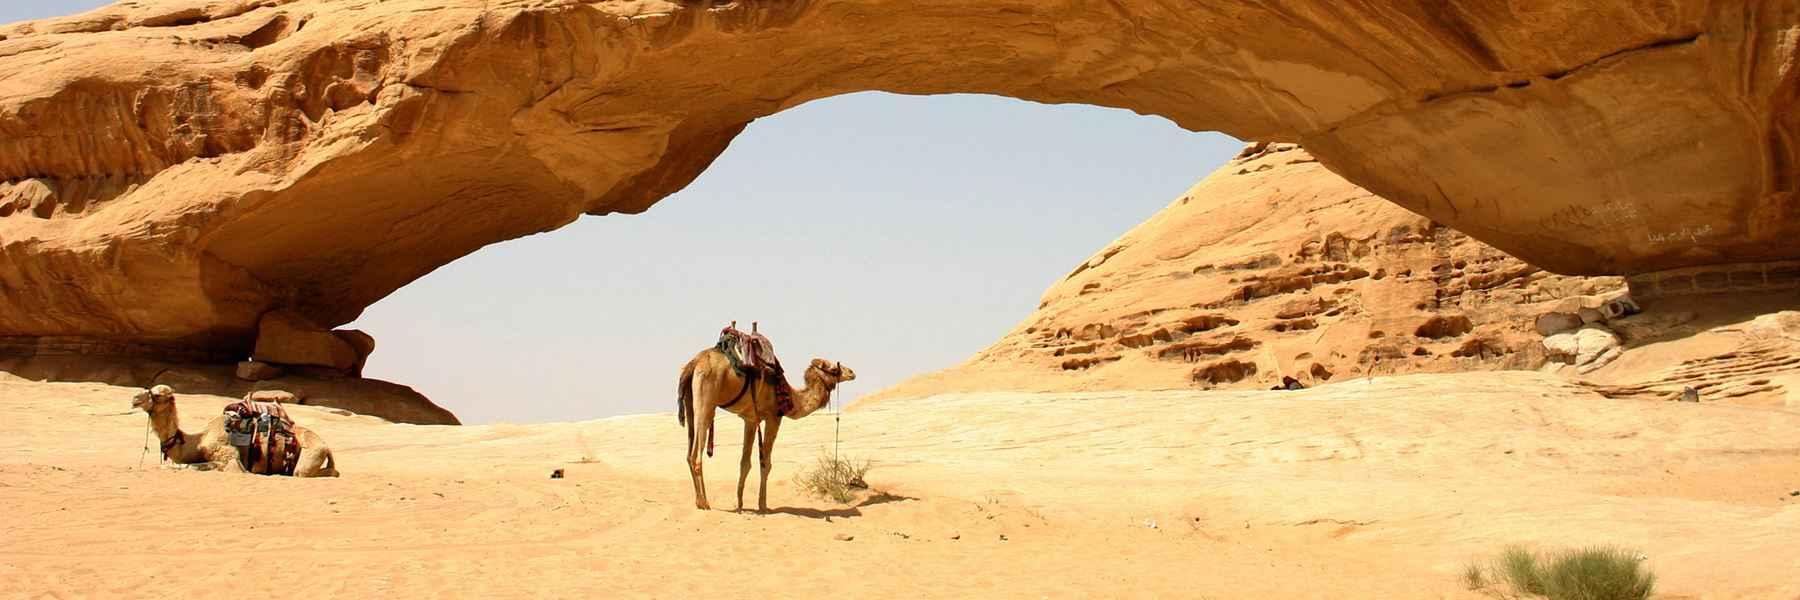 екскурзия Йордания цена